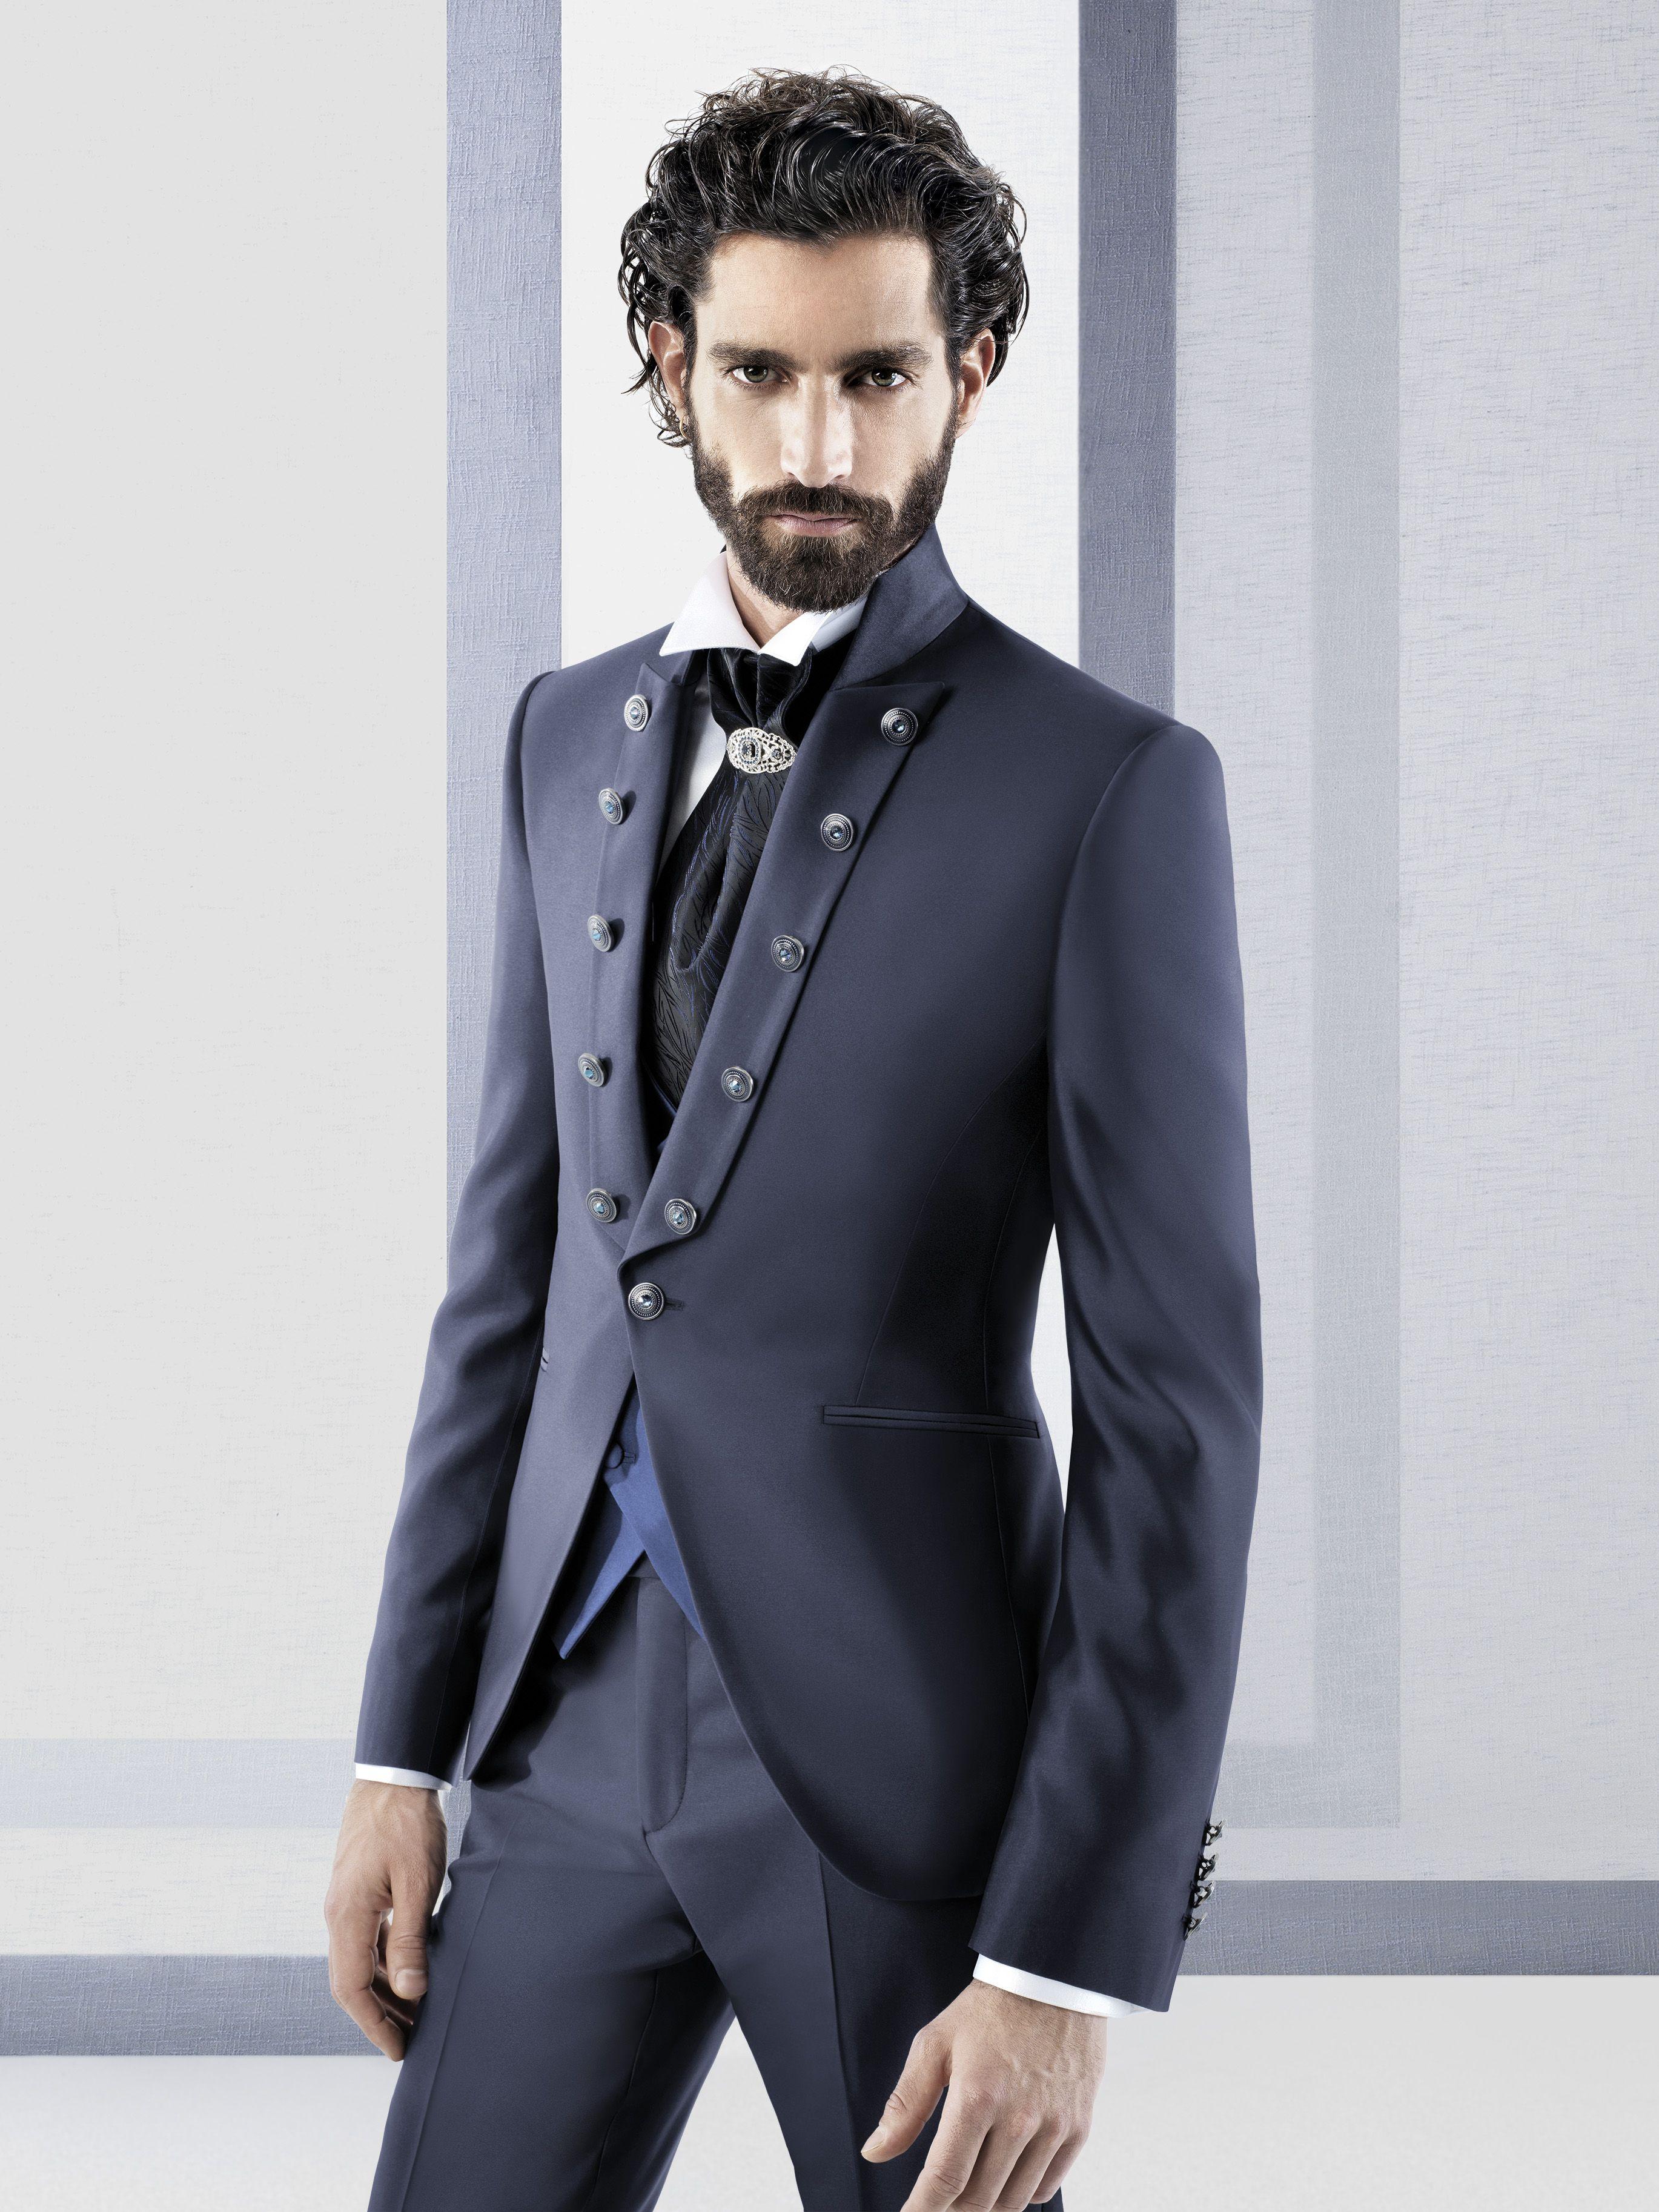 45bfc3aa913a Carlo Pignatelli Cerimonia 2017  carlopignatelli  sposo  groom   abitodasposo  suit  wedding  matrimonio  weddingday